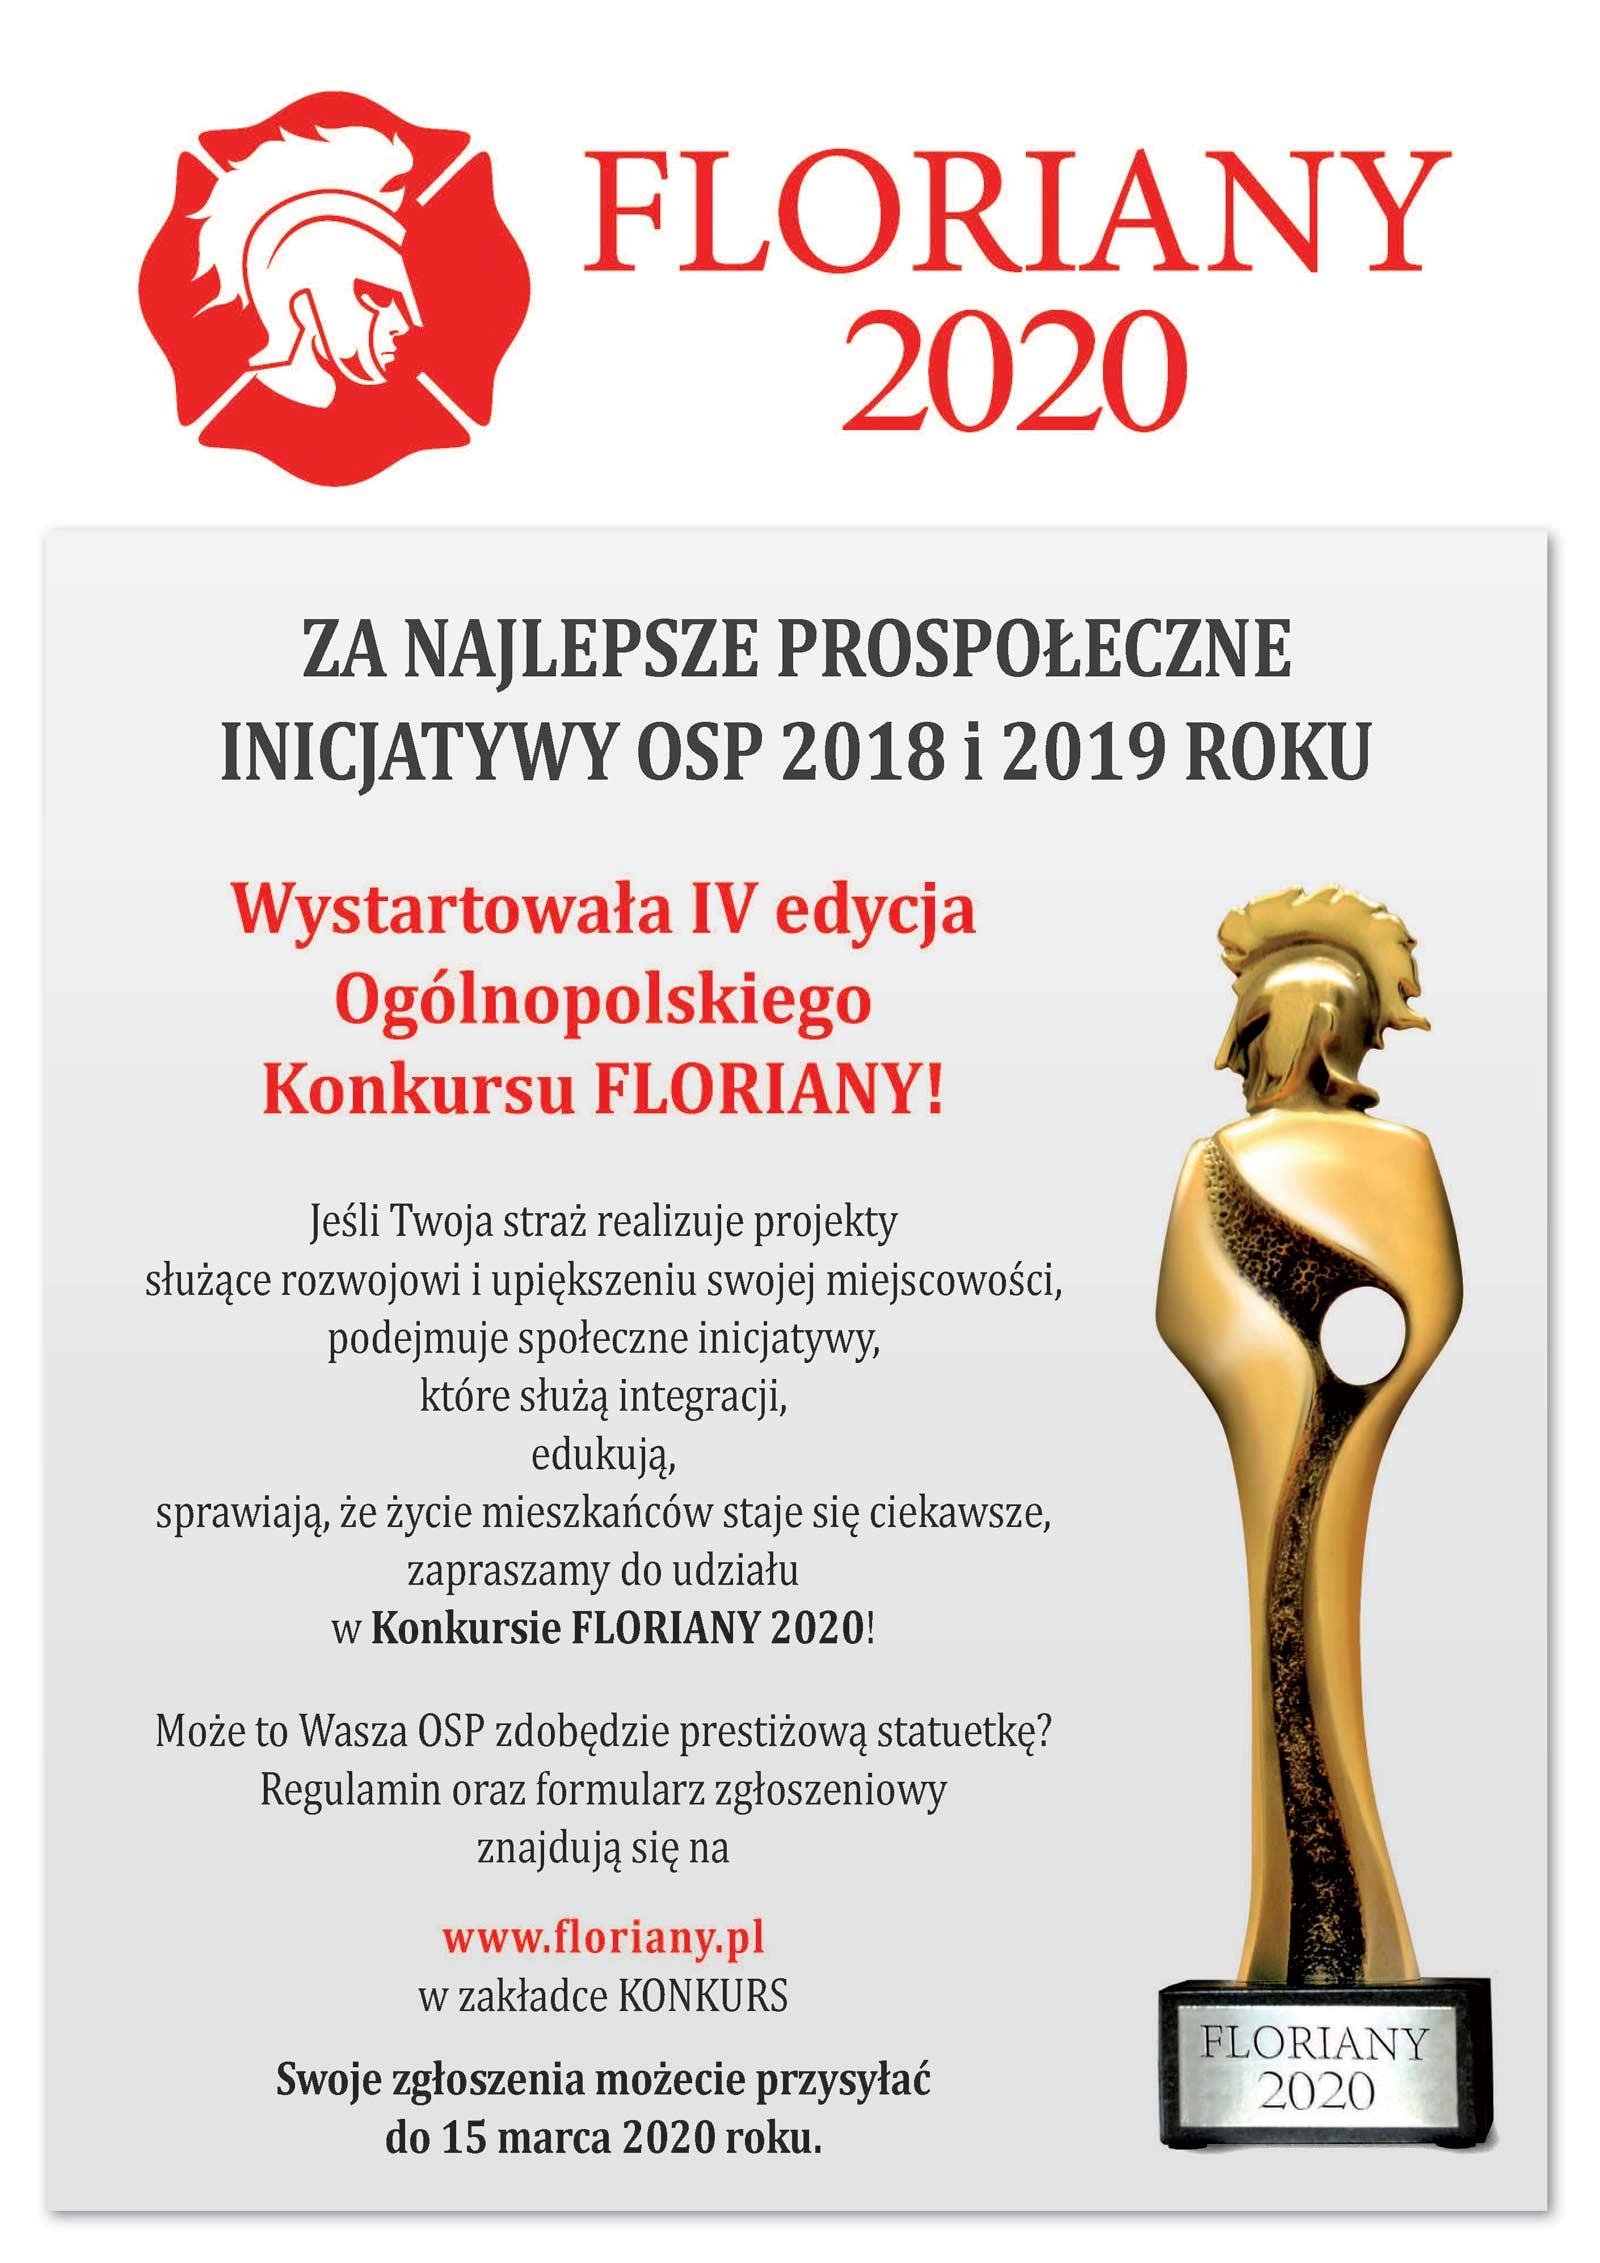 http://m.wm.pl/2020/02/orig/0000008200-plakat-floriany-2020-613794.jpg